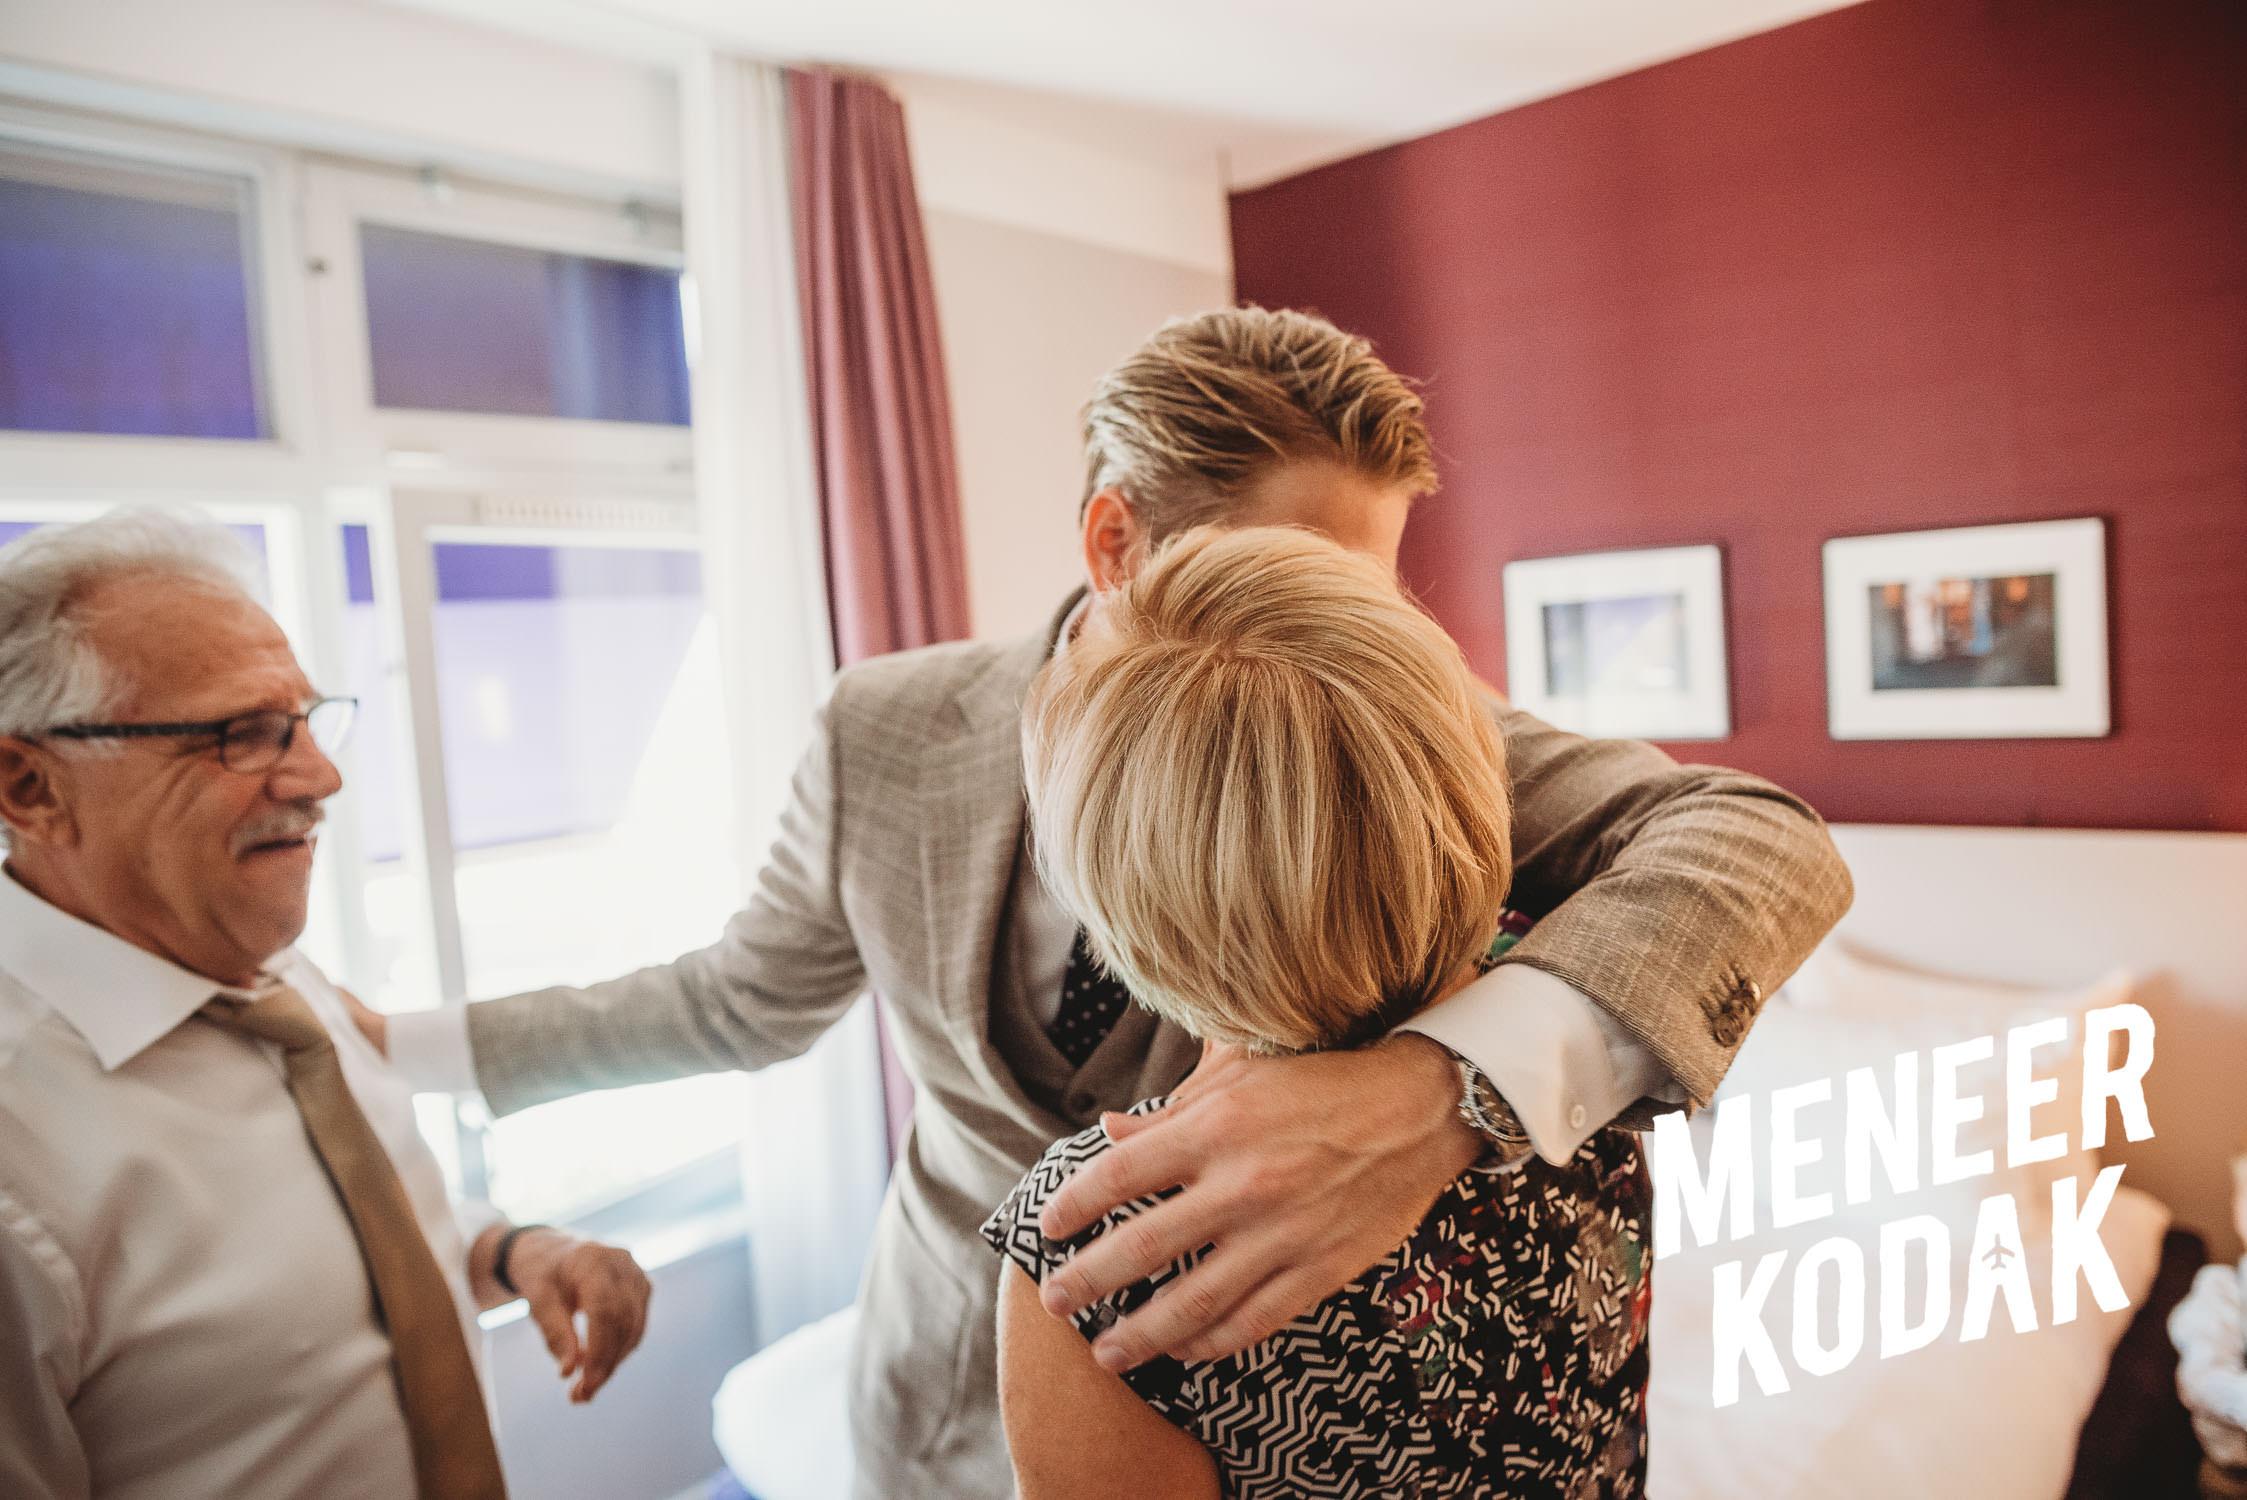 Meneer Kodak - Strandbruiloft - Noordwijk - K&A-061.jpg